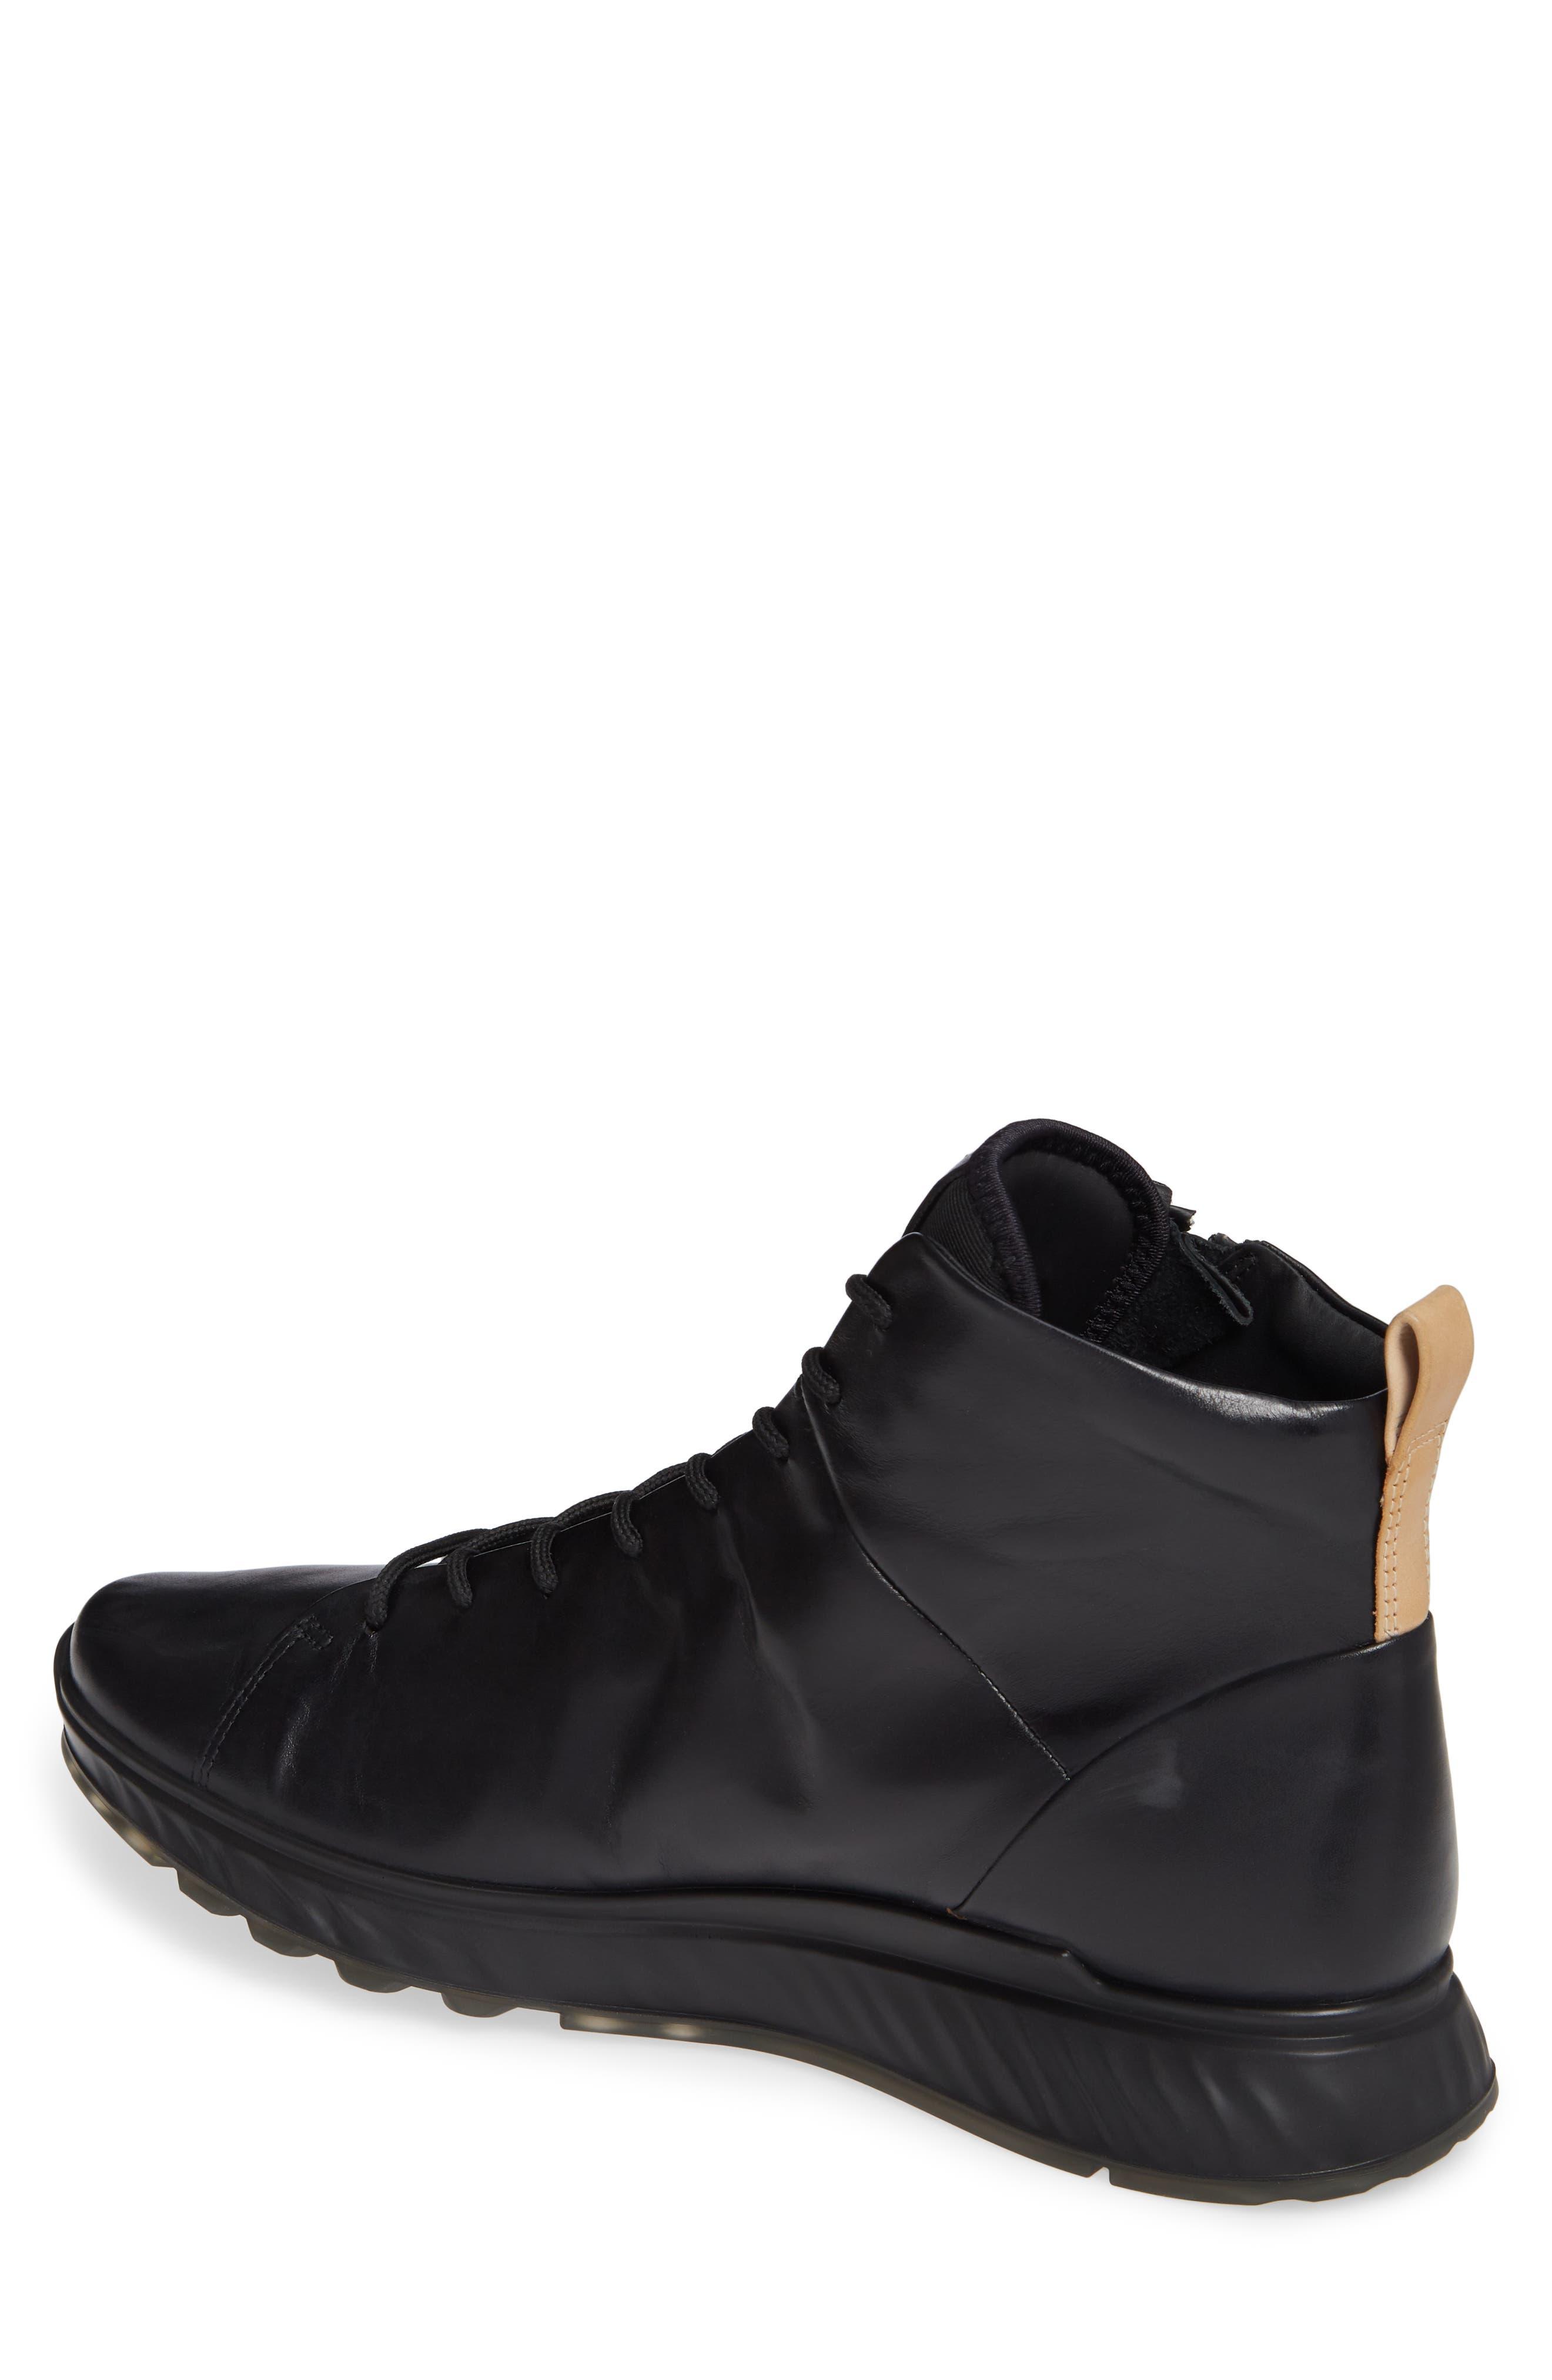 ST1 High Top Sneaker,                             Alternate thumbnail 2, color,                             BLACK/BLACK LEATHER